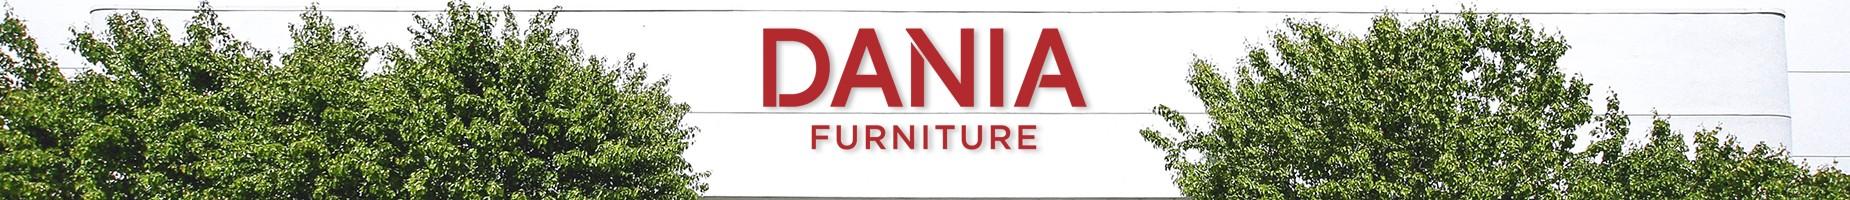 Dania Furniture Linkedin, Dania Furniture Tukwila